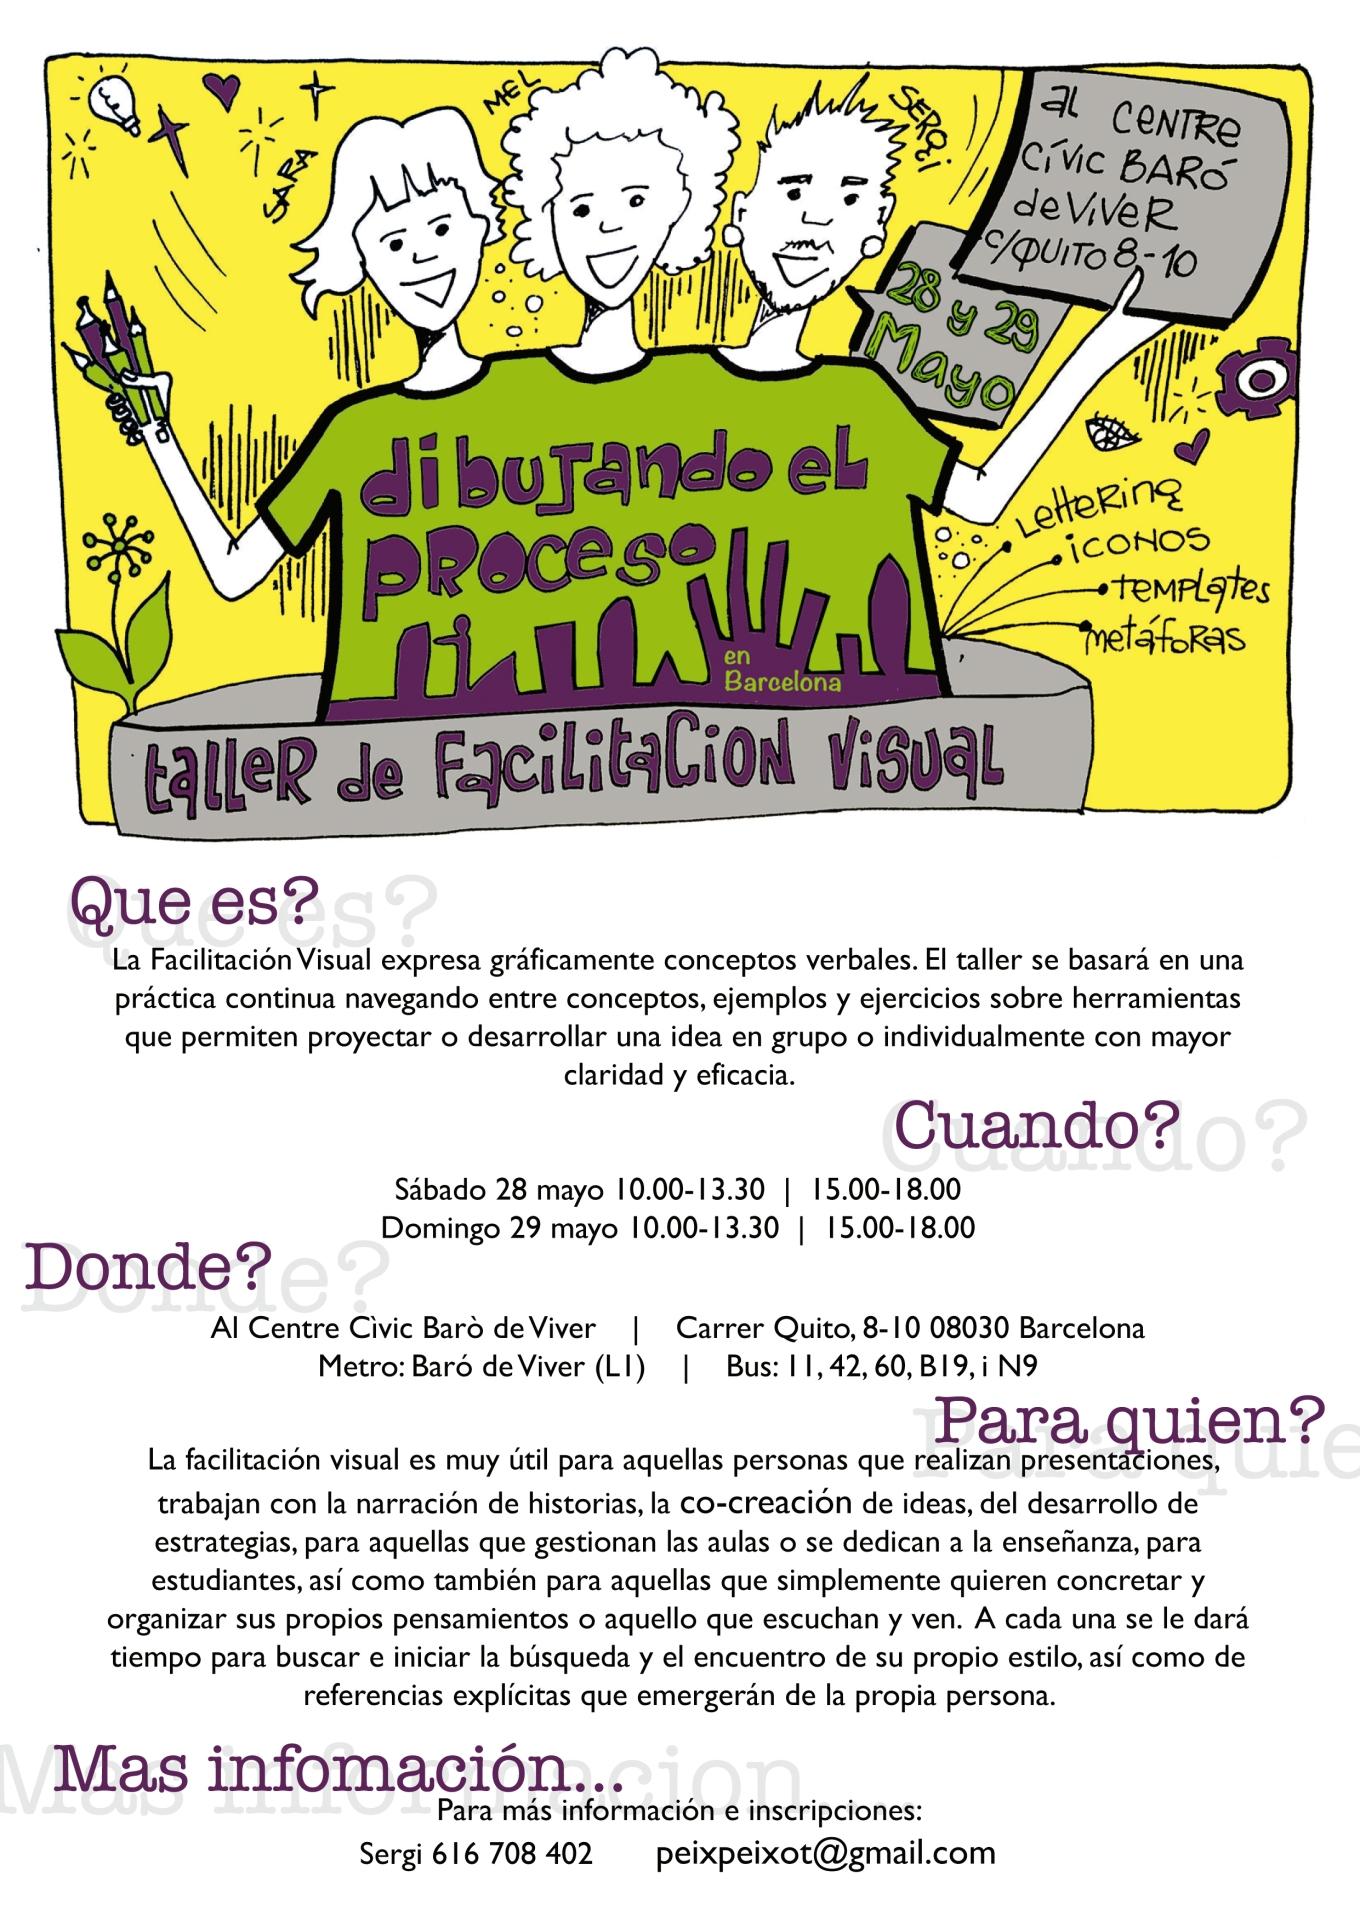 Facilitacio_Visual_Seminari_Maig_Barcelona